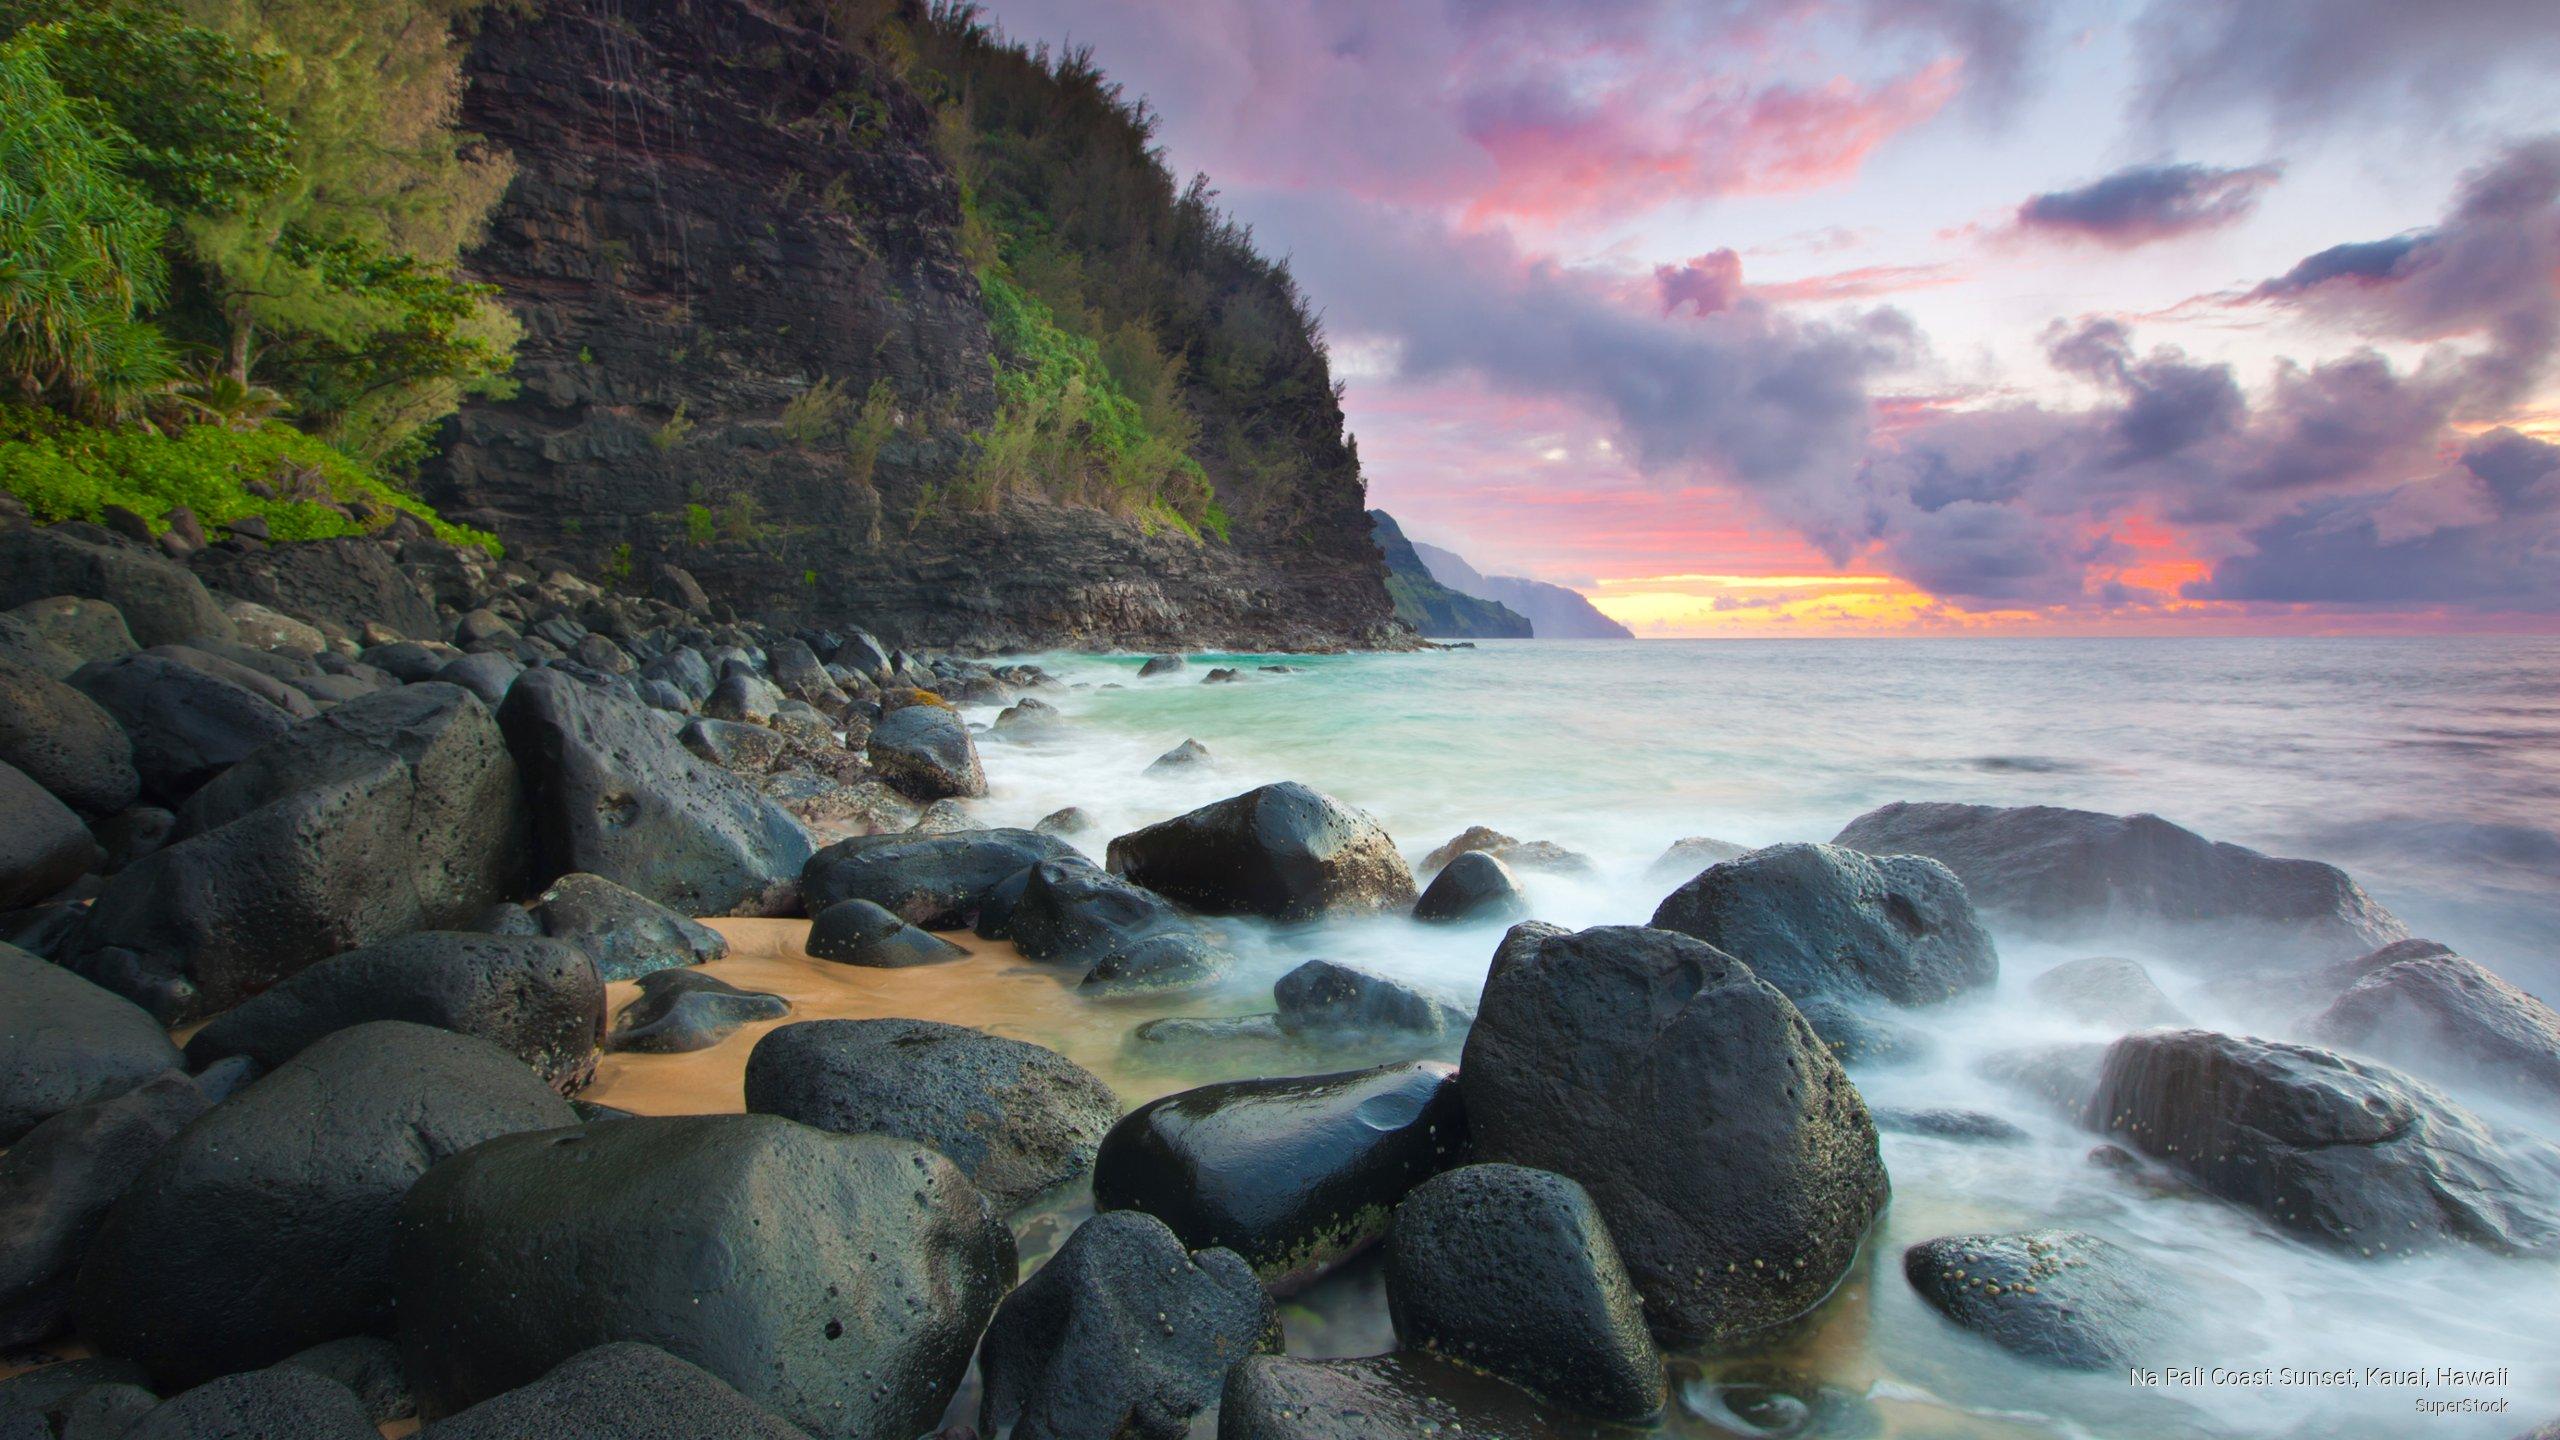 Na Pali Coast Sunset, Kauai, Hawaii